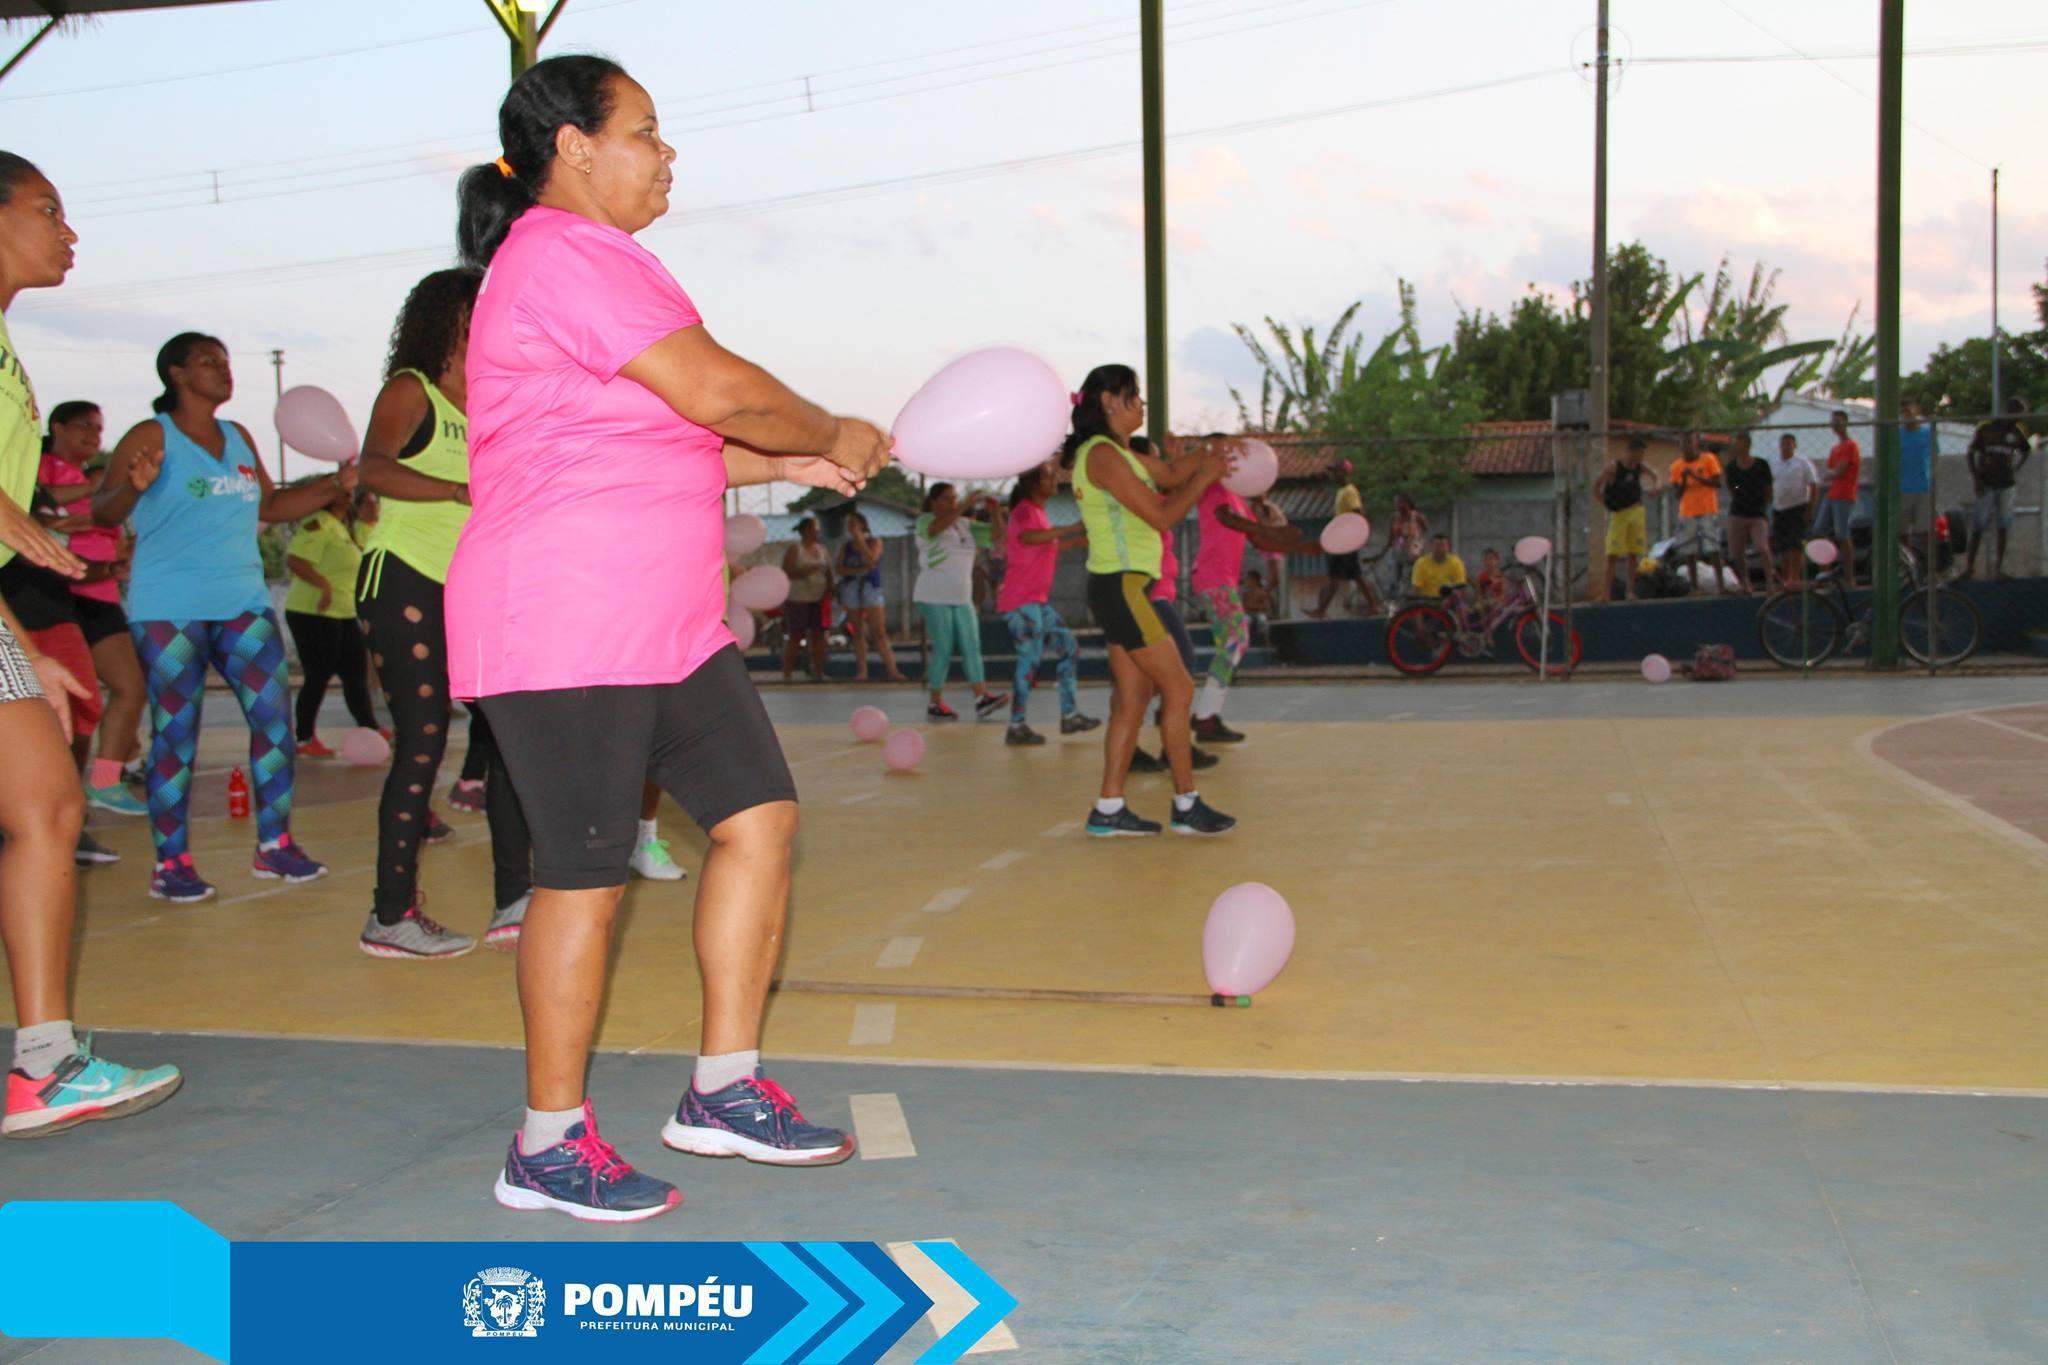 Programa 'Mexa-se Pompéu' abre mais um polo e proporciona atividades físicas aos moradores